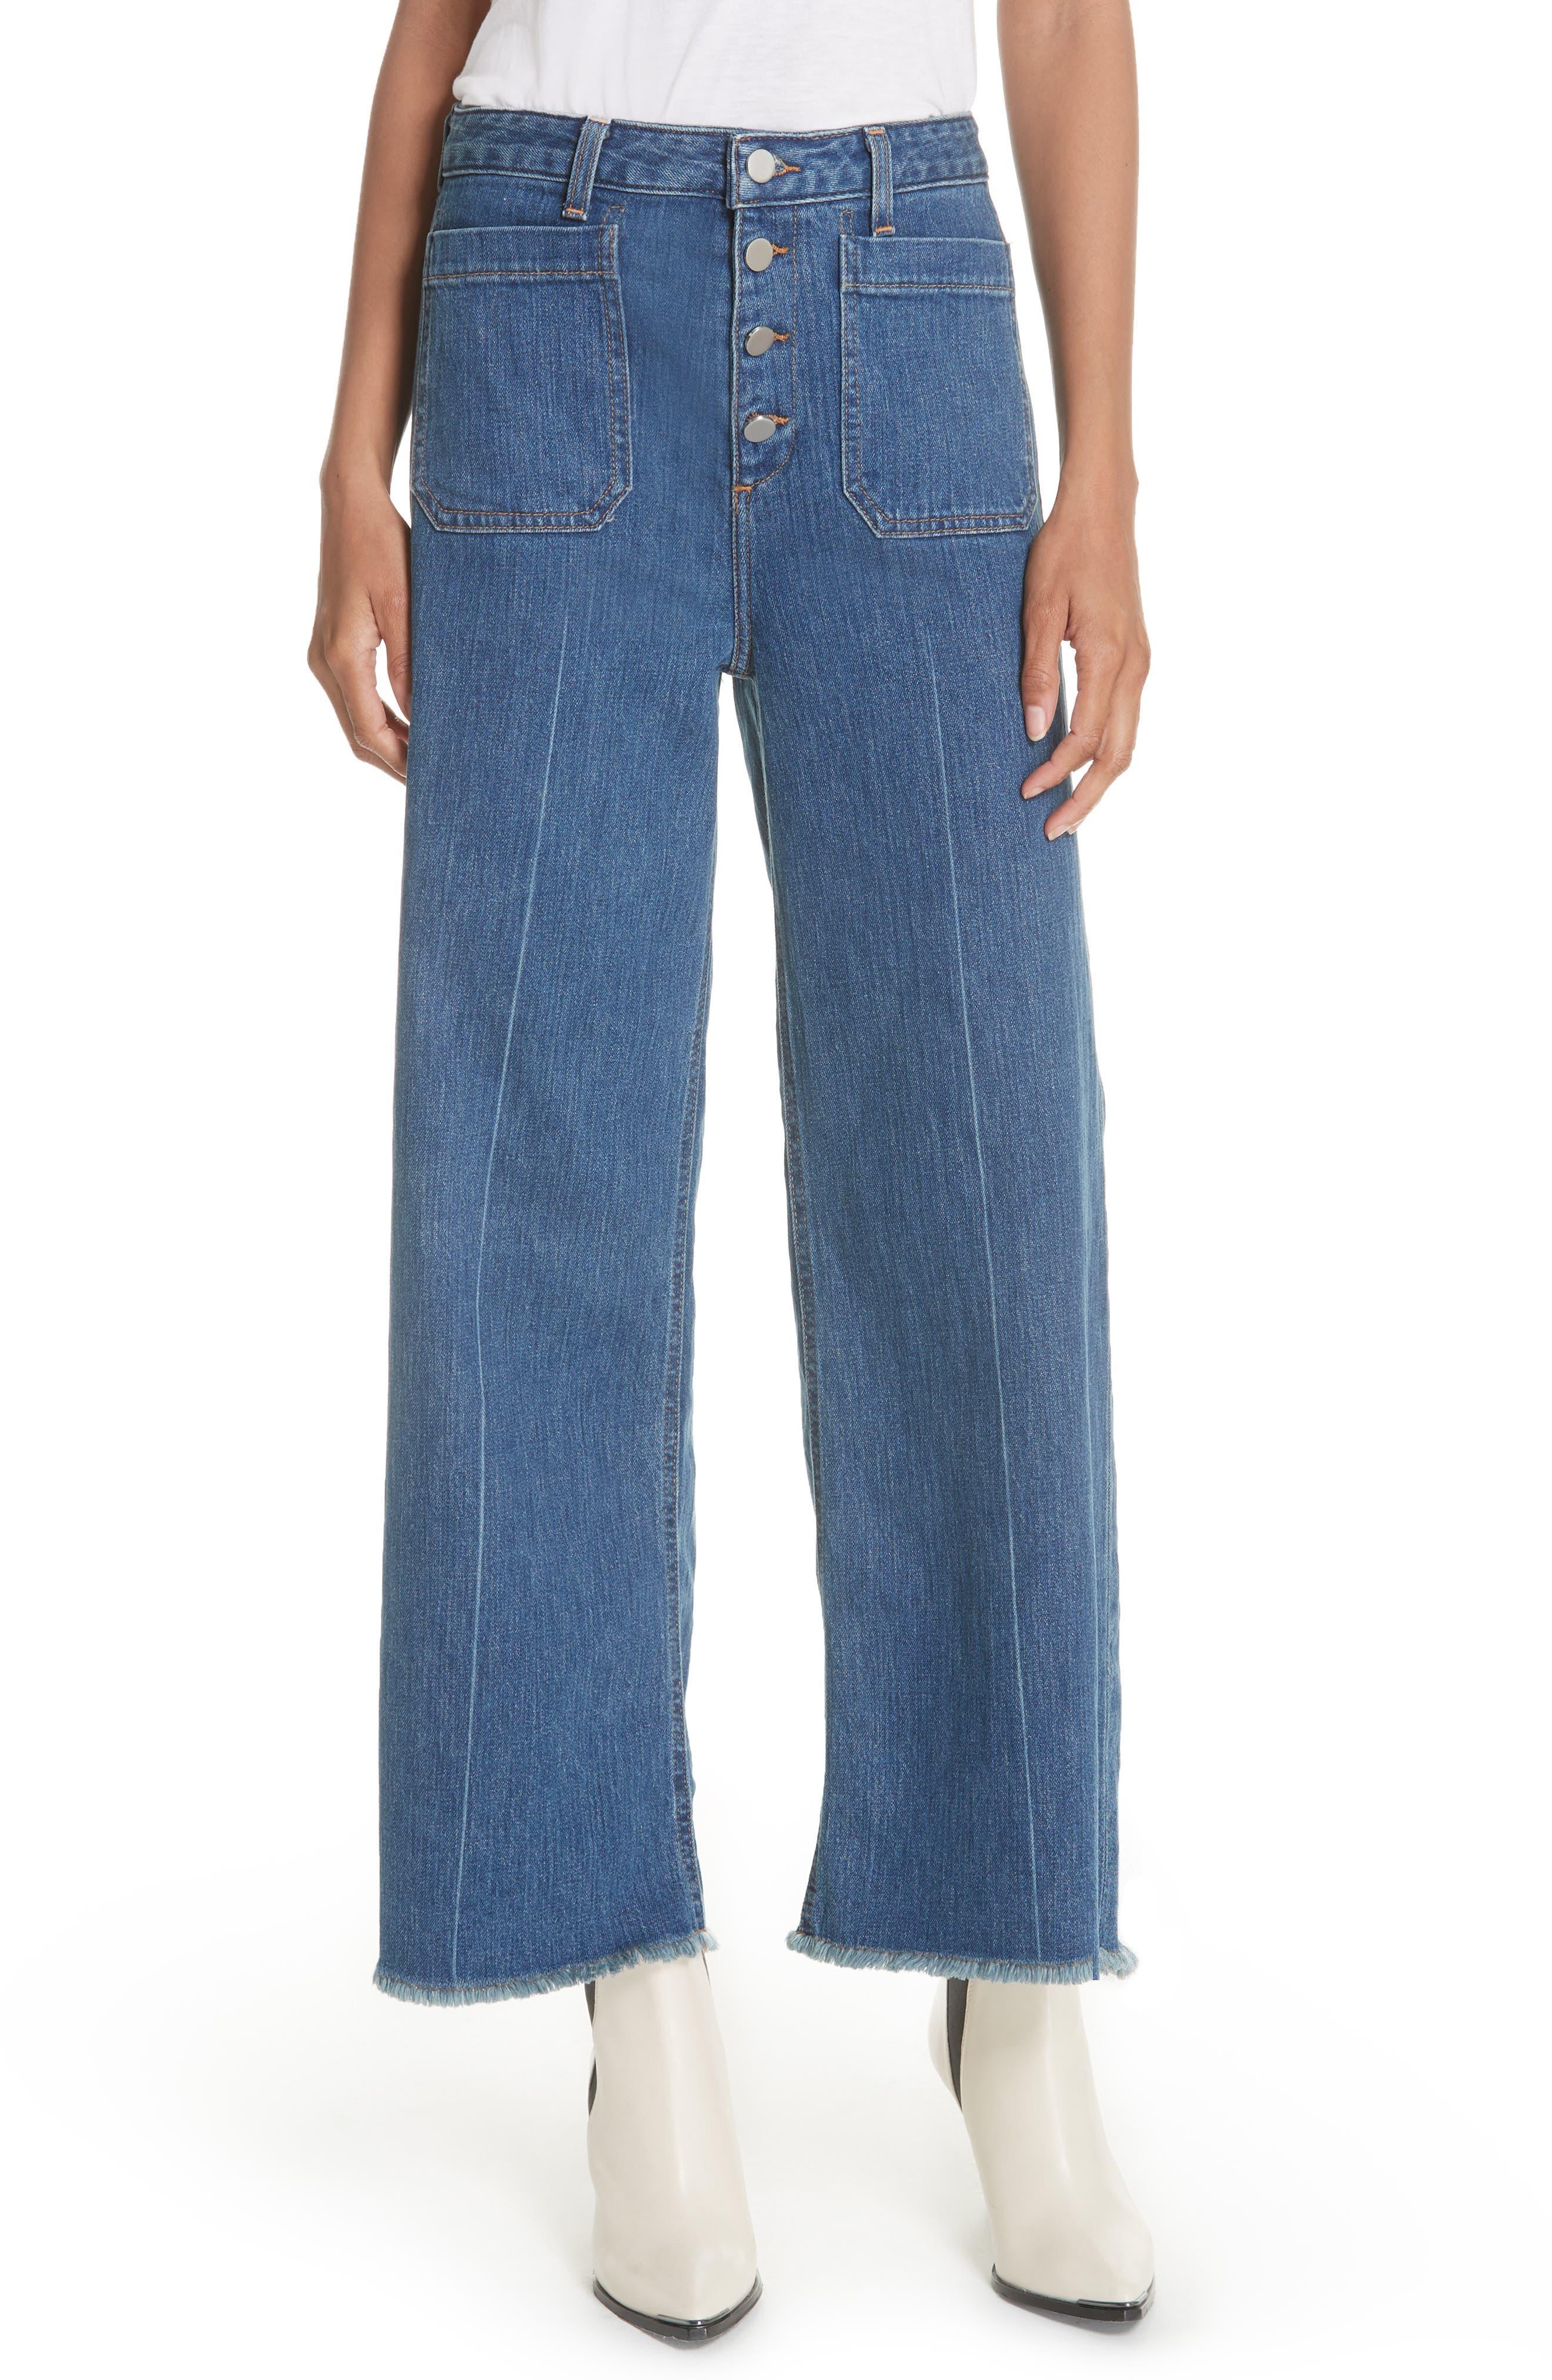 Carmine Wide Leg Jeans,                             Main thumbnail 1, color,                             Medium Denim